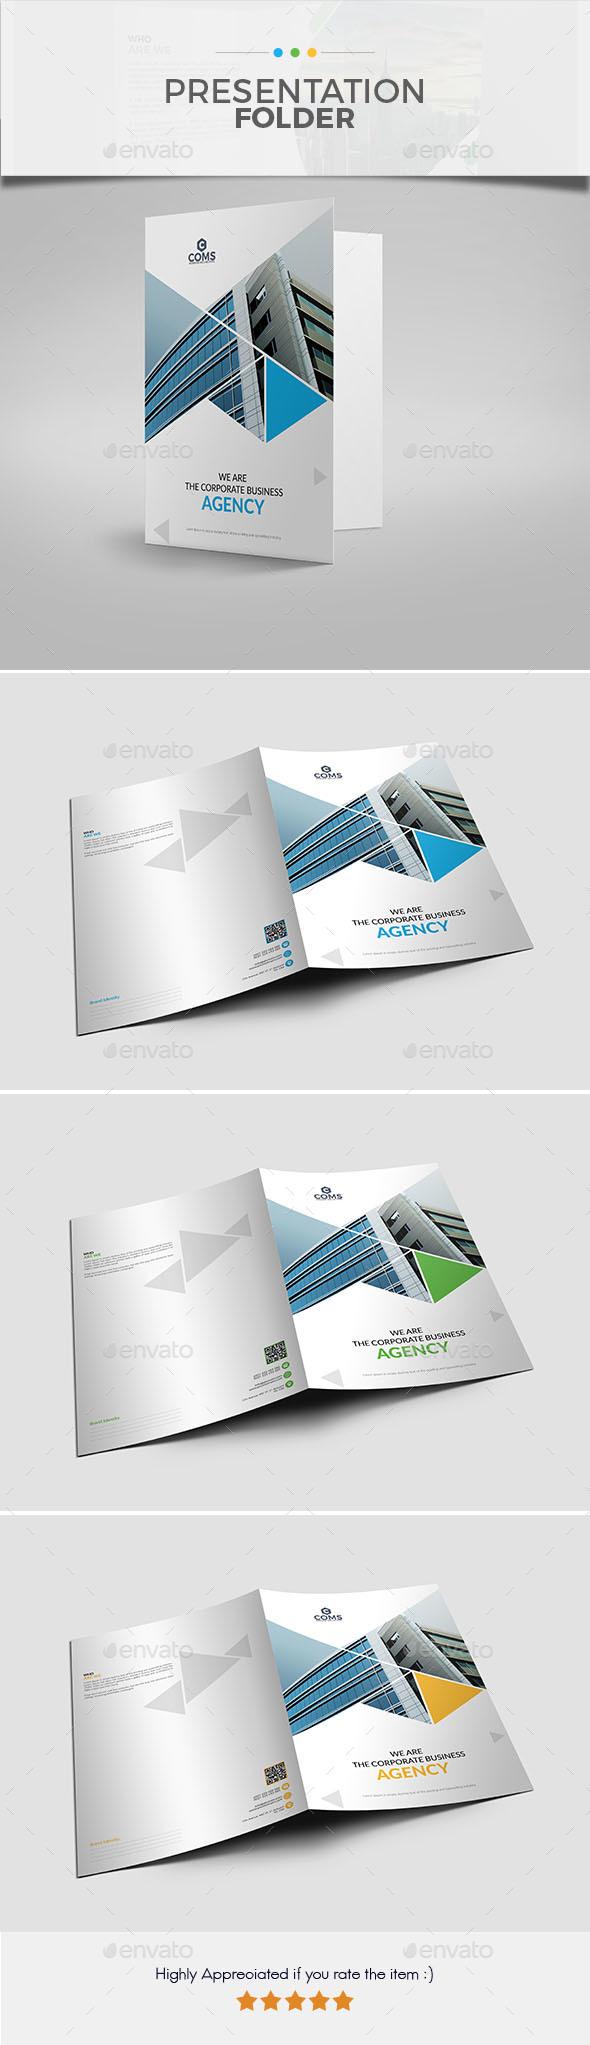 Presentation Folder 06 - Stationery Print Templates